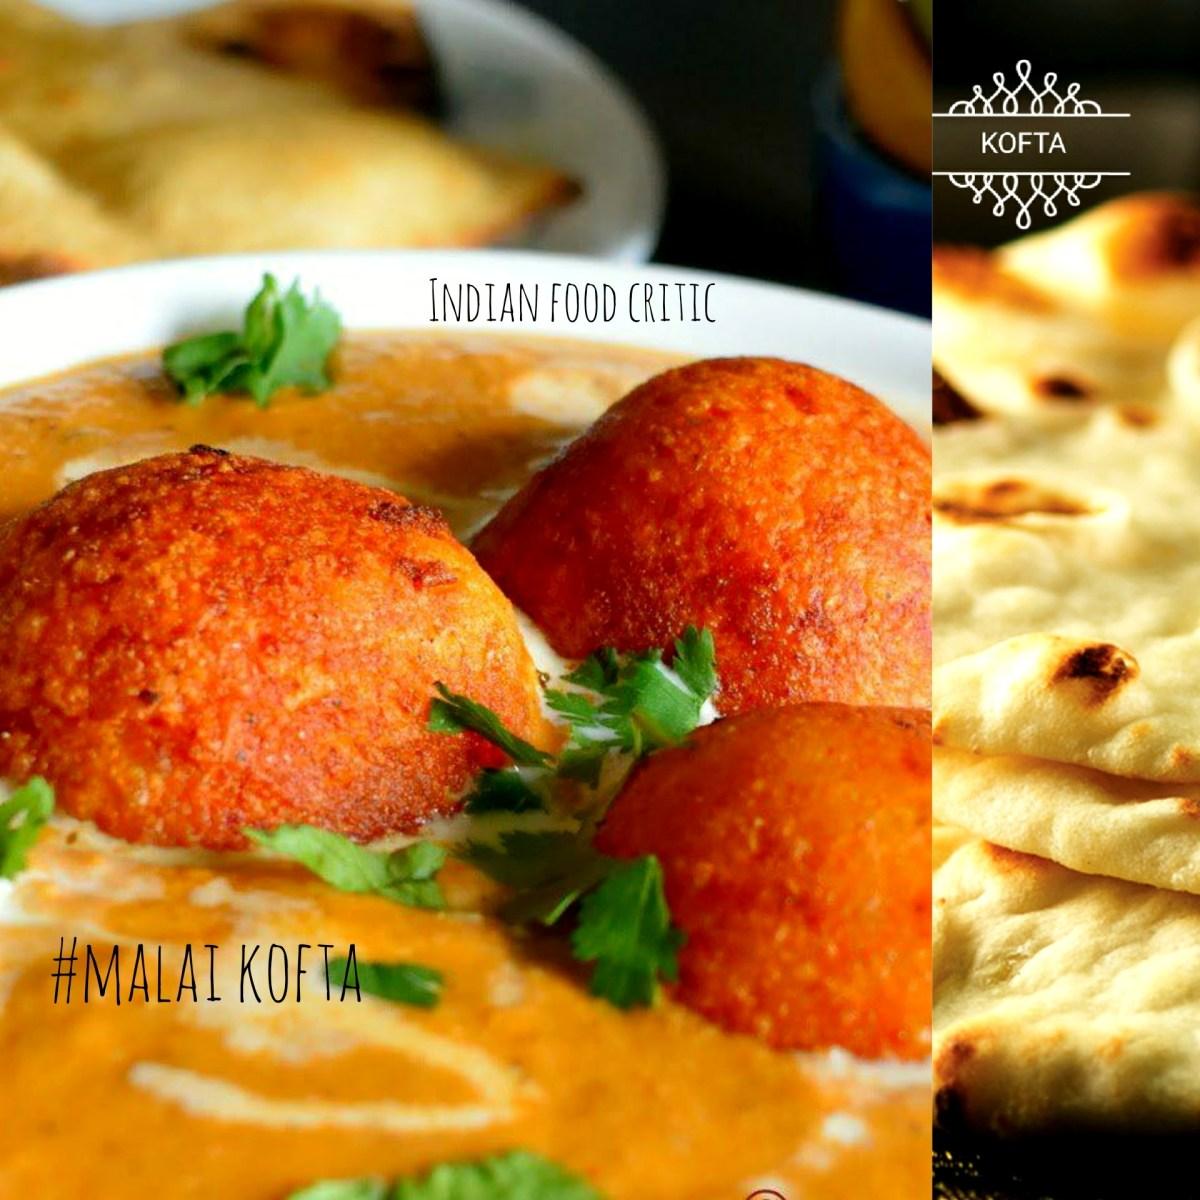 Malai Kofta | Malai Kofta Gravy | Malai Kofta Gravy Restaurant Style | 4.60/5.0